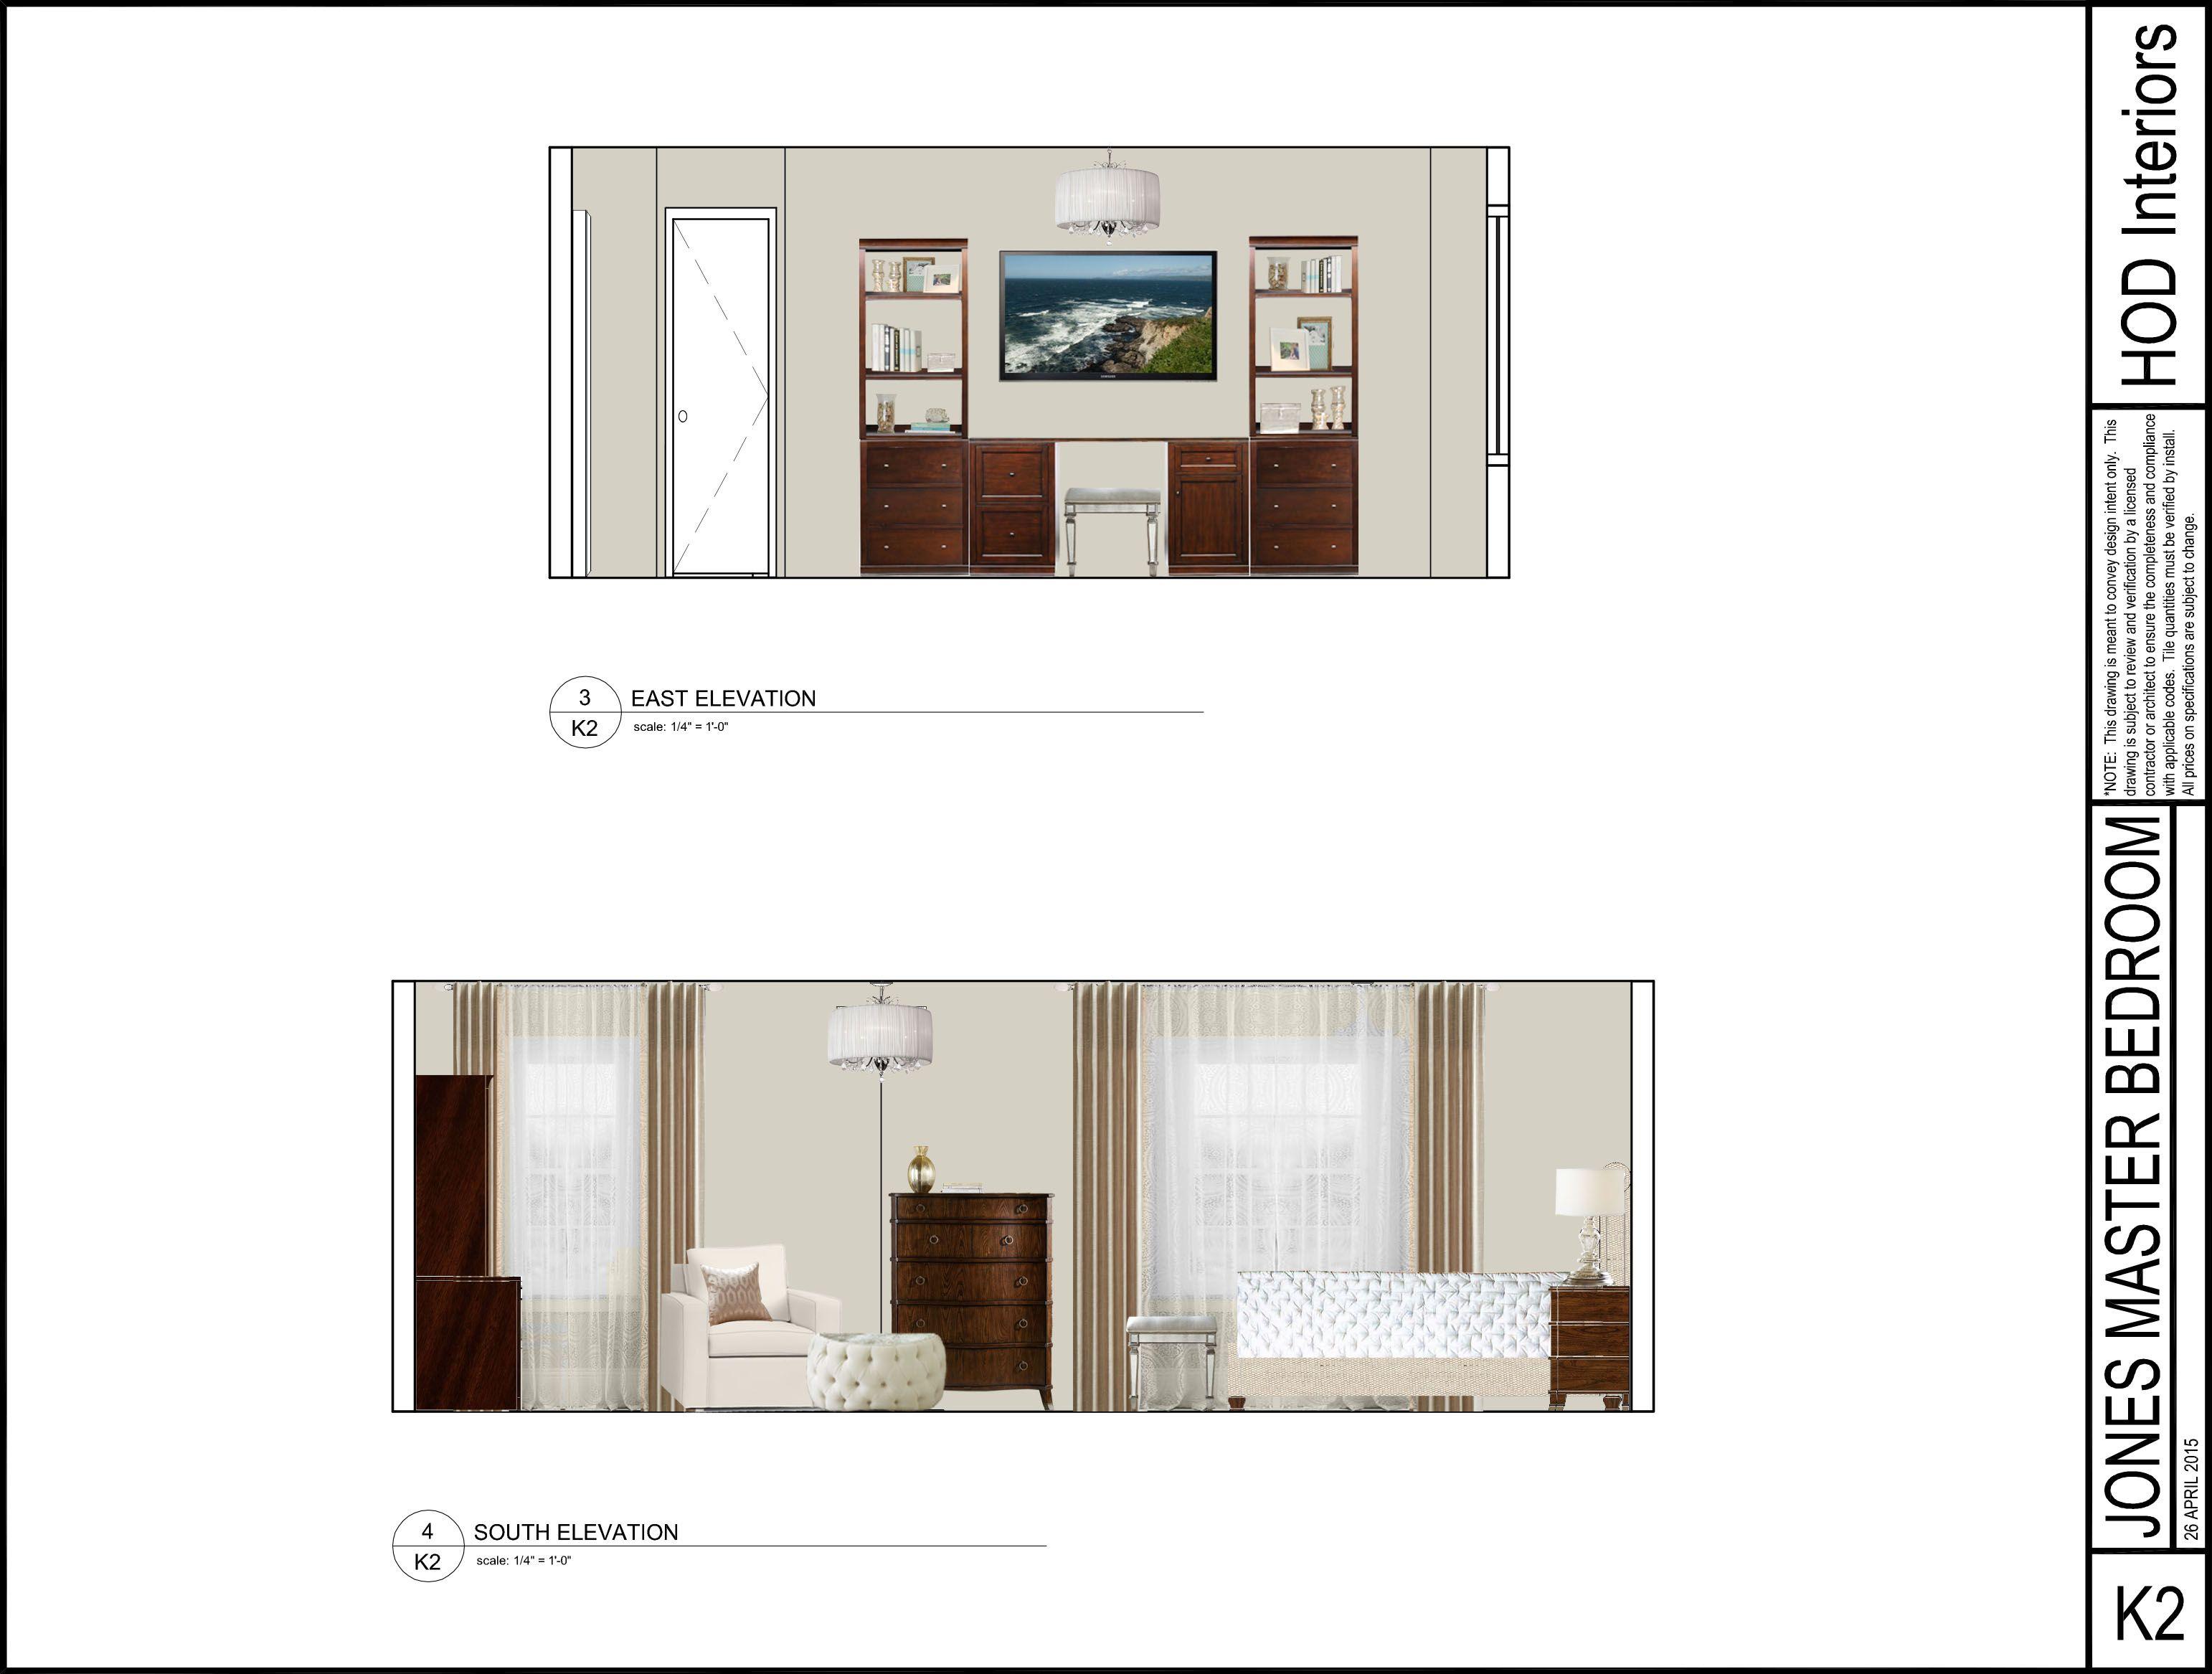 Front Elevation Beds : Photoshop elevation laura jones design service bedroom